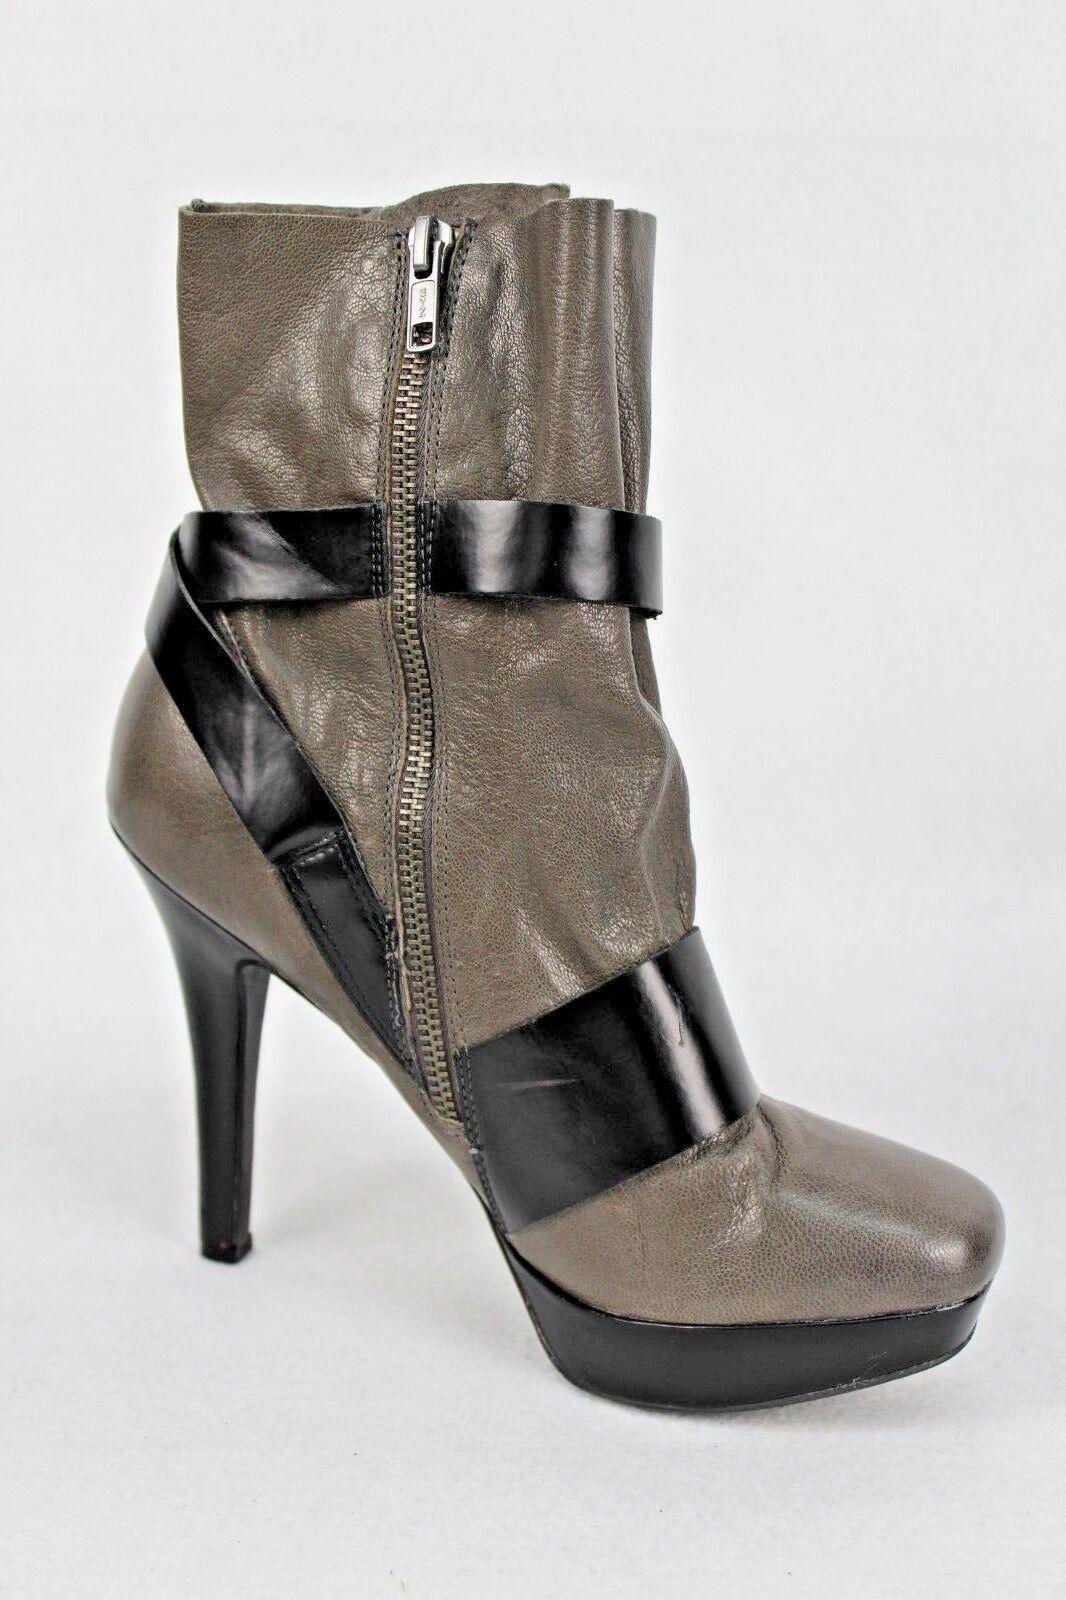 Bacio 61 61 61 Women's Esatto Cement Leather wedge  Boots Sz 8 37d8d8